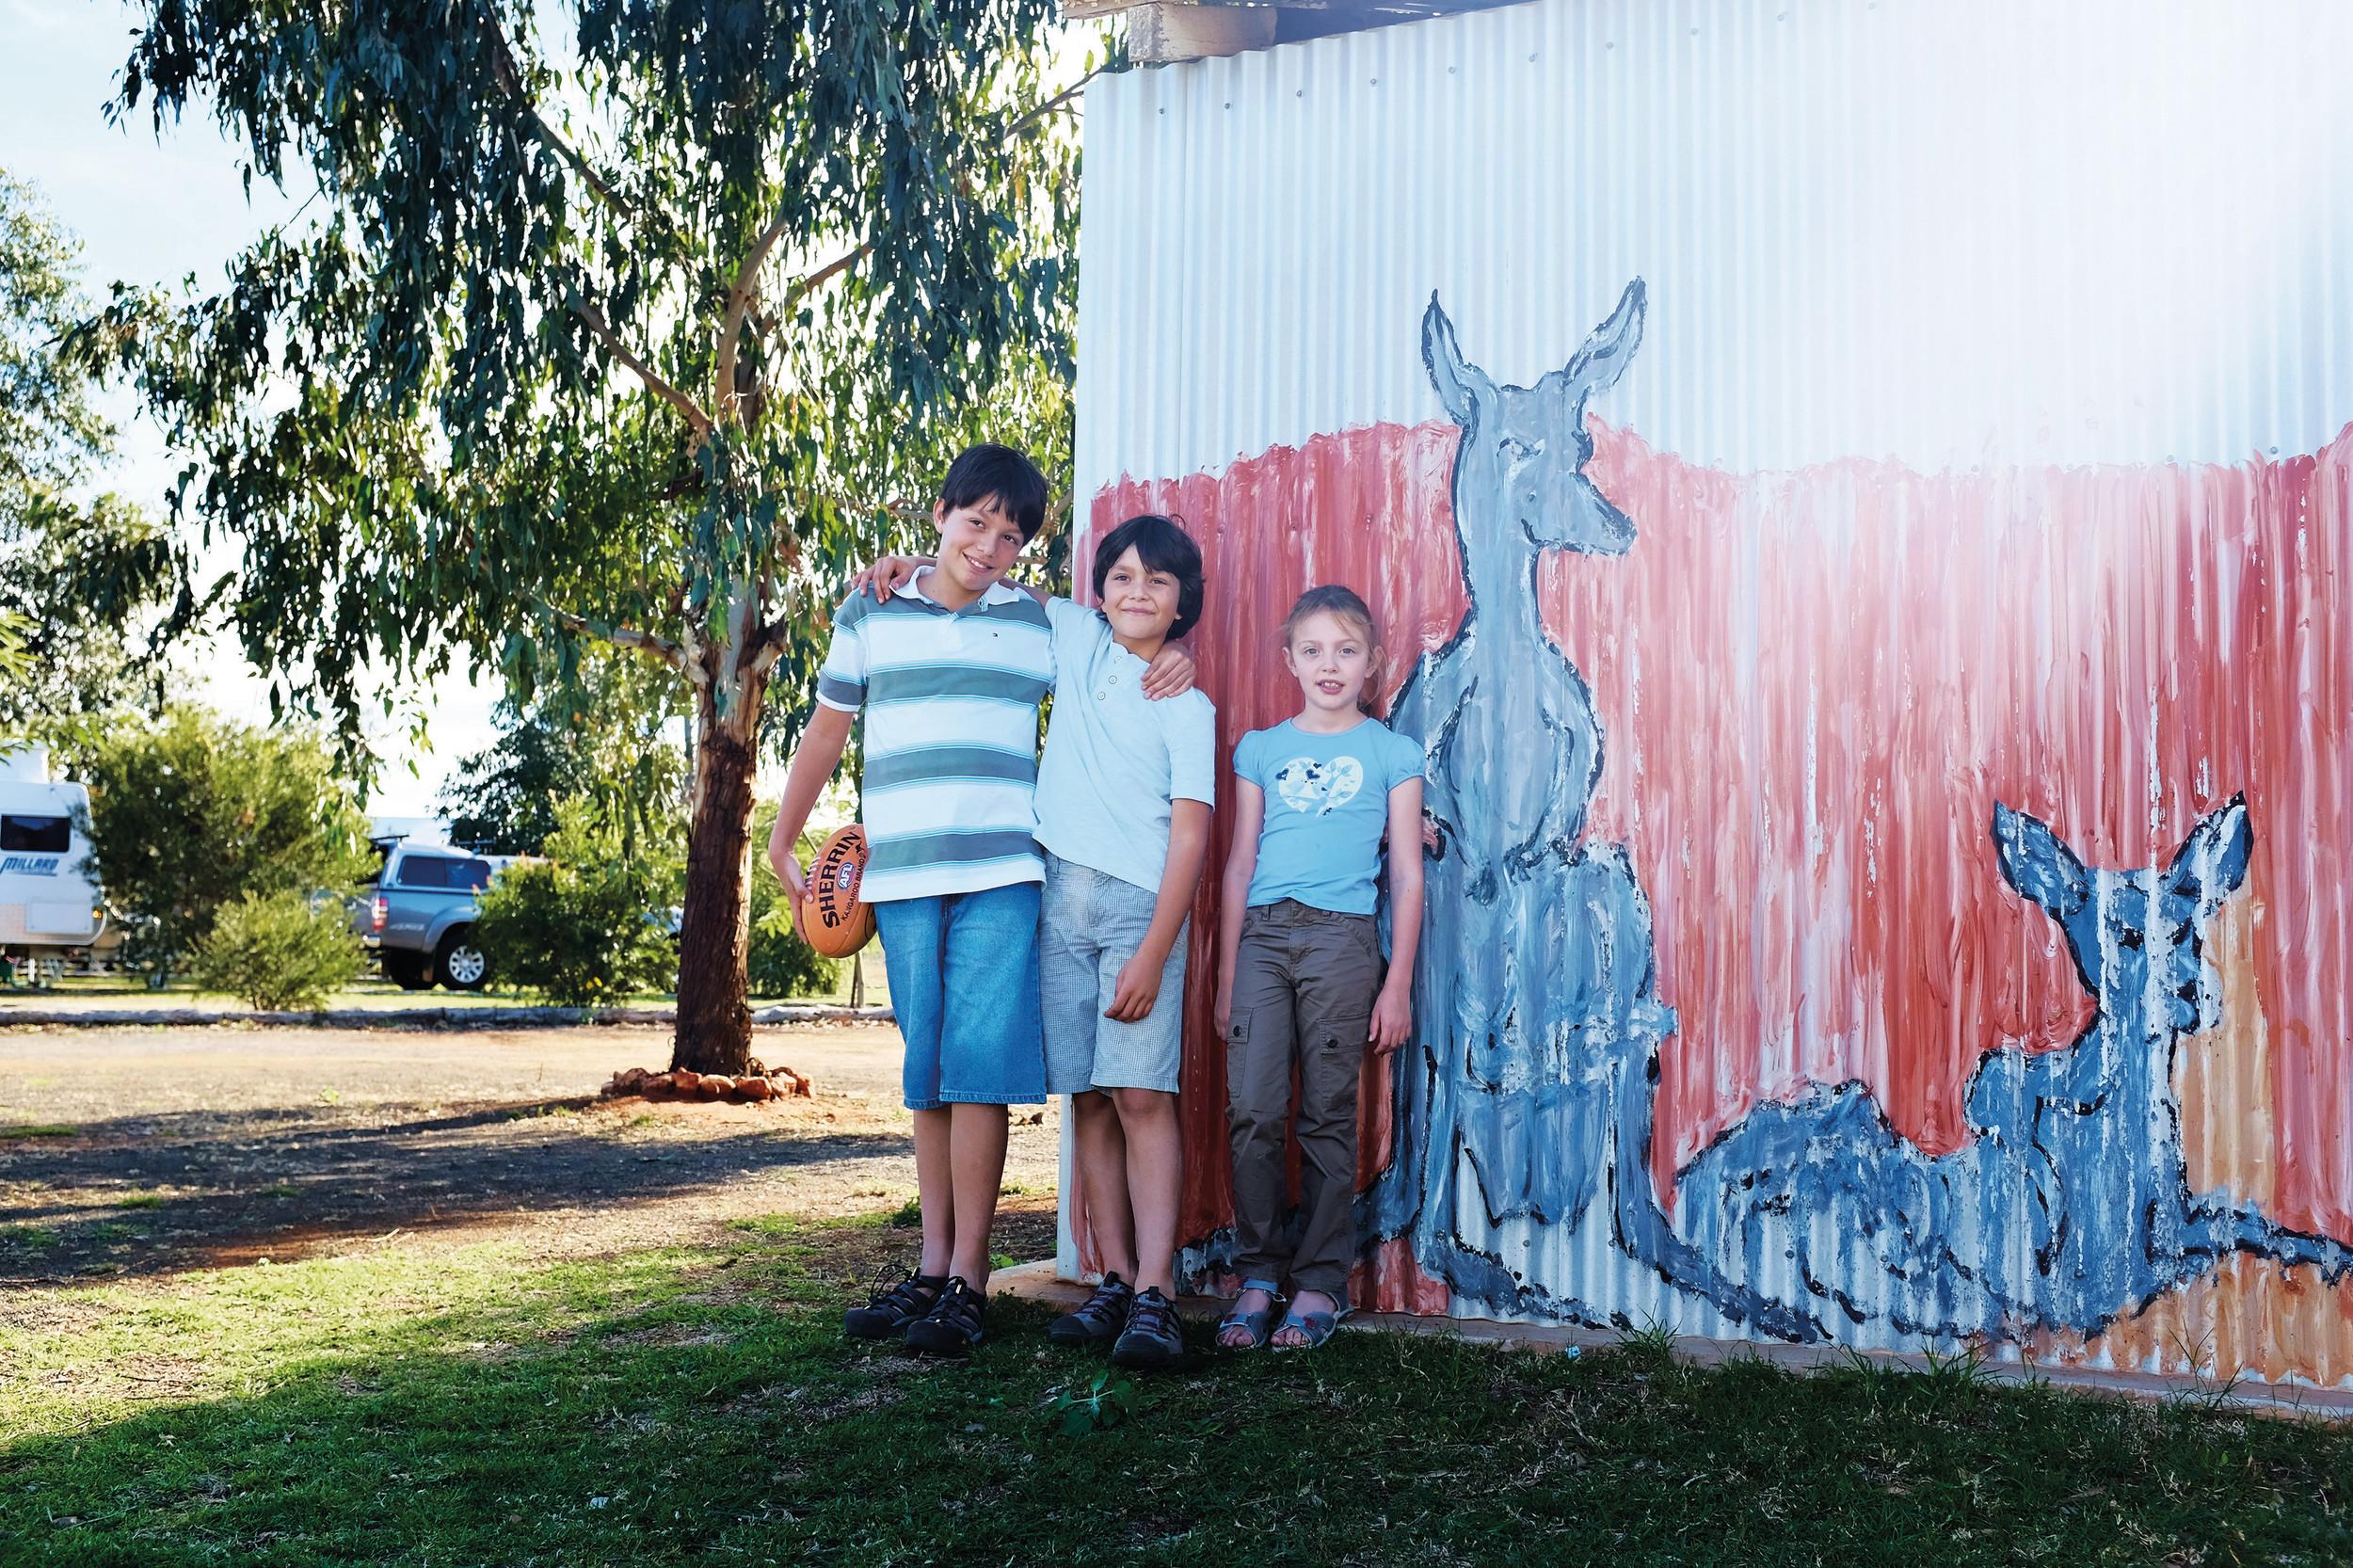 Charleville - Kids standing next to artwork on a shed.jpg